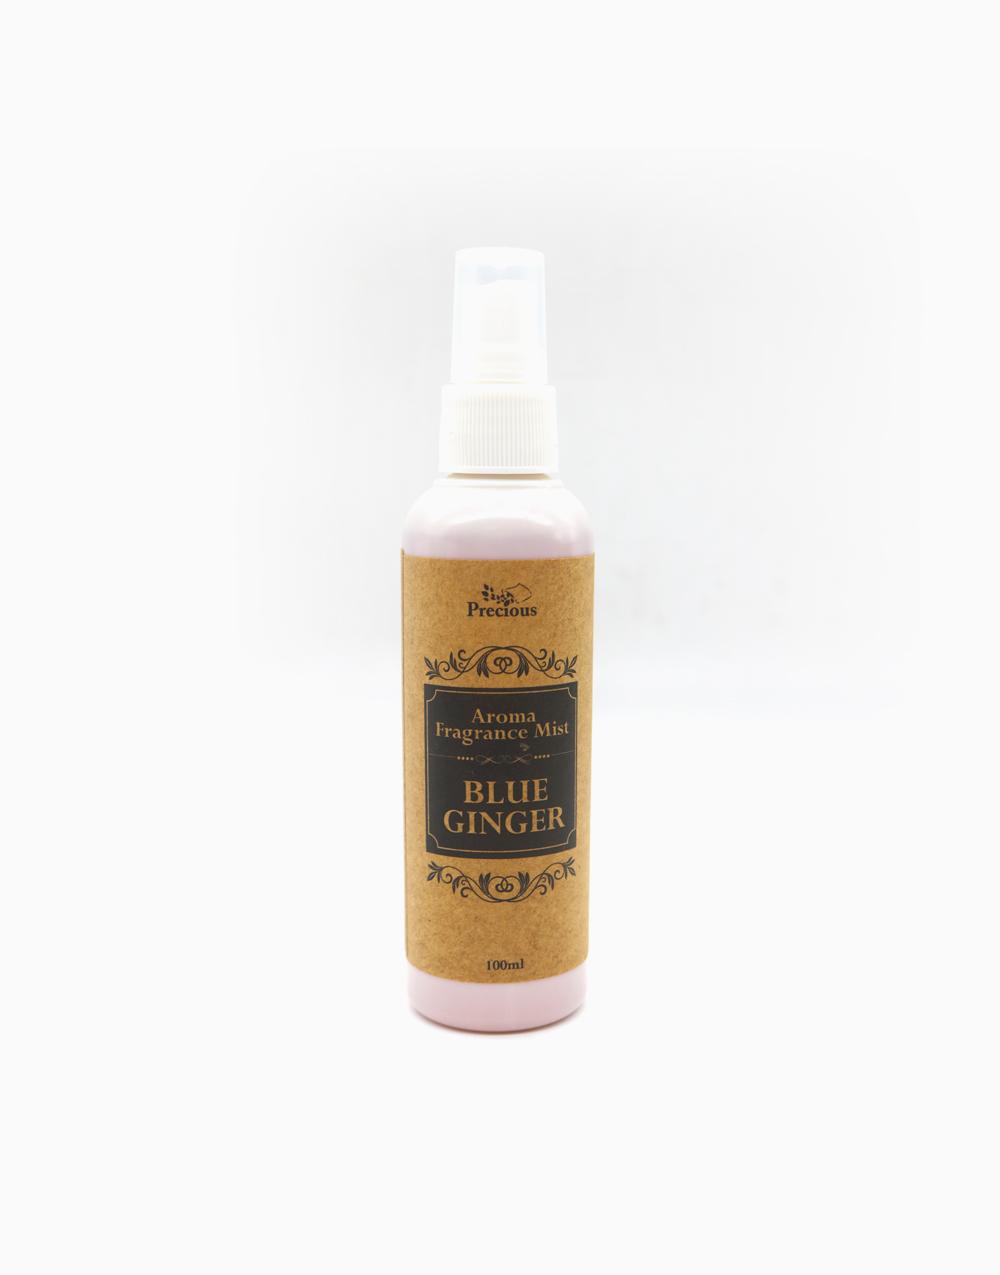 Precious Aroma Fragrance Mist (100ml) by Precious Herbal Pillow | Blue Ginger